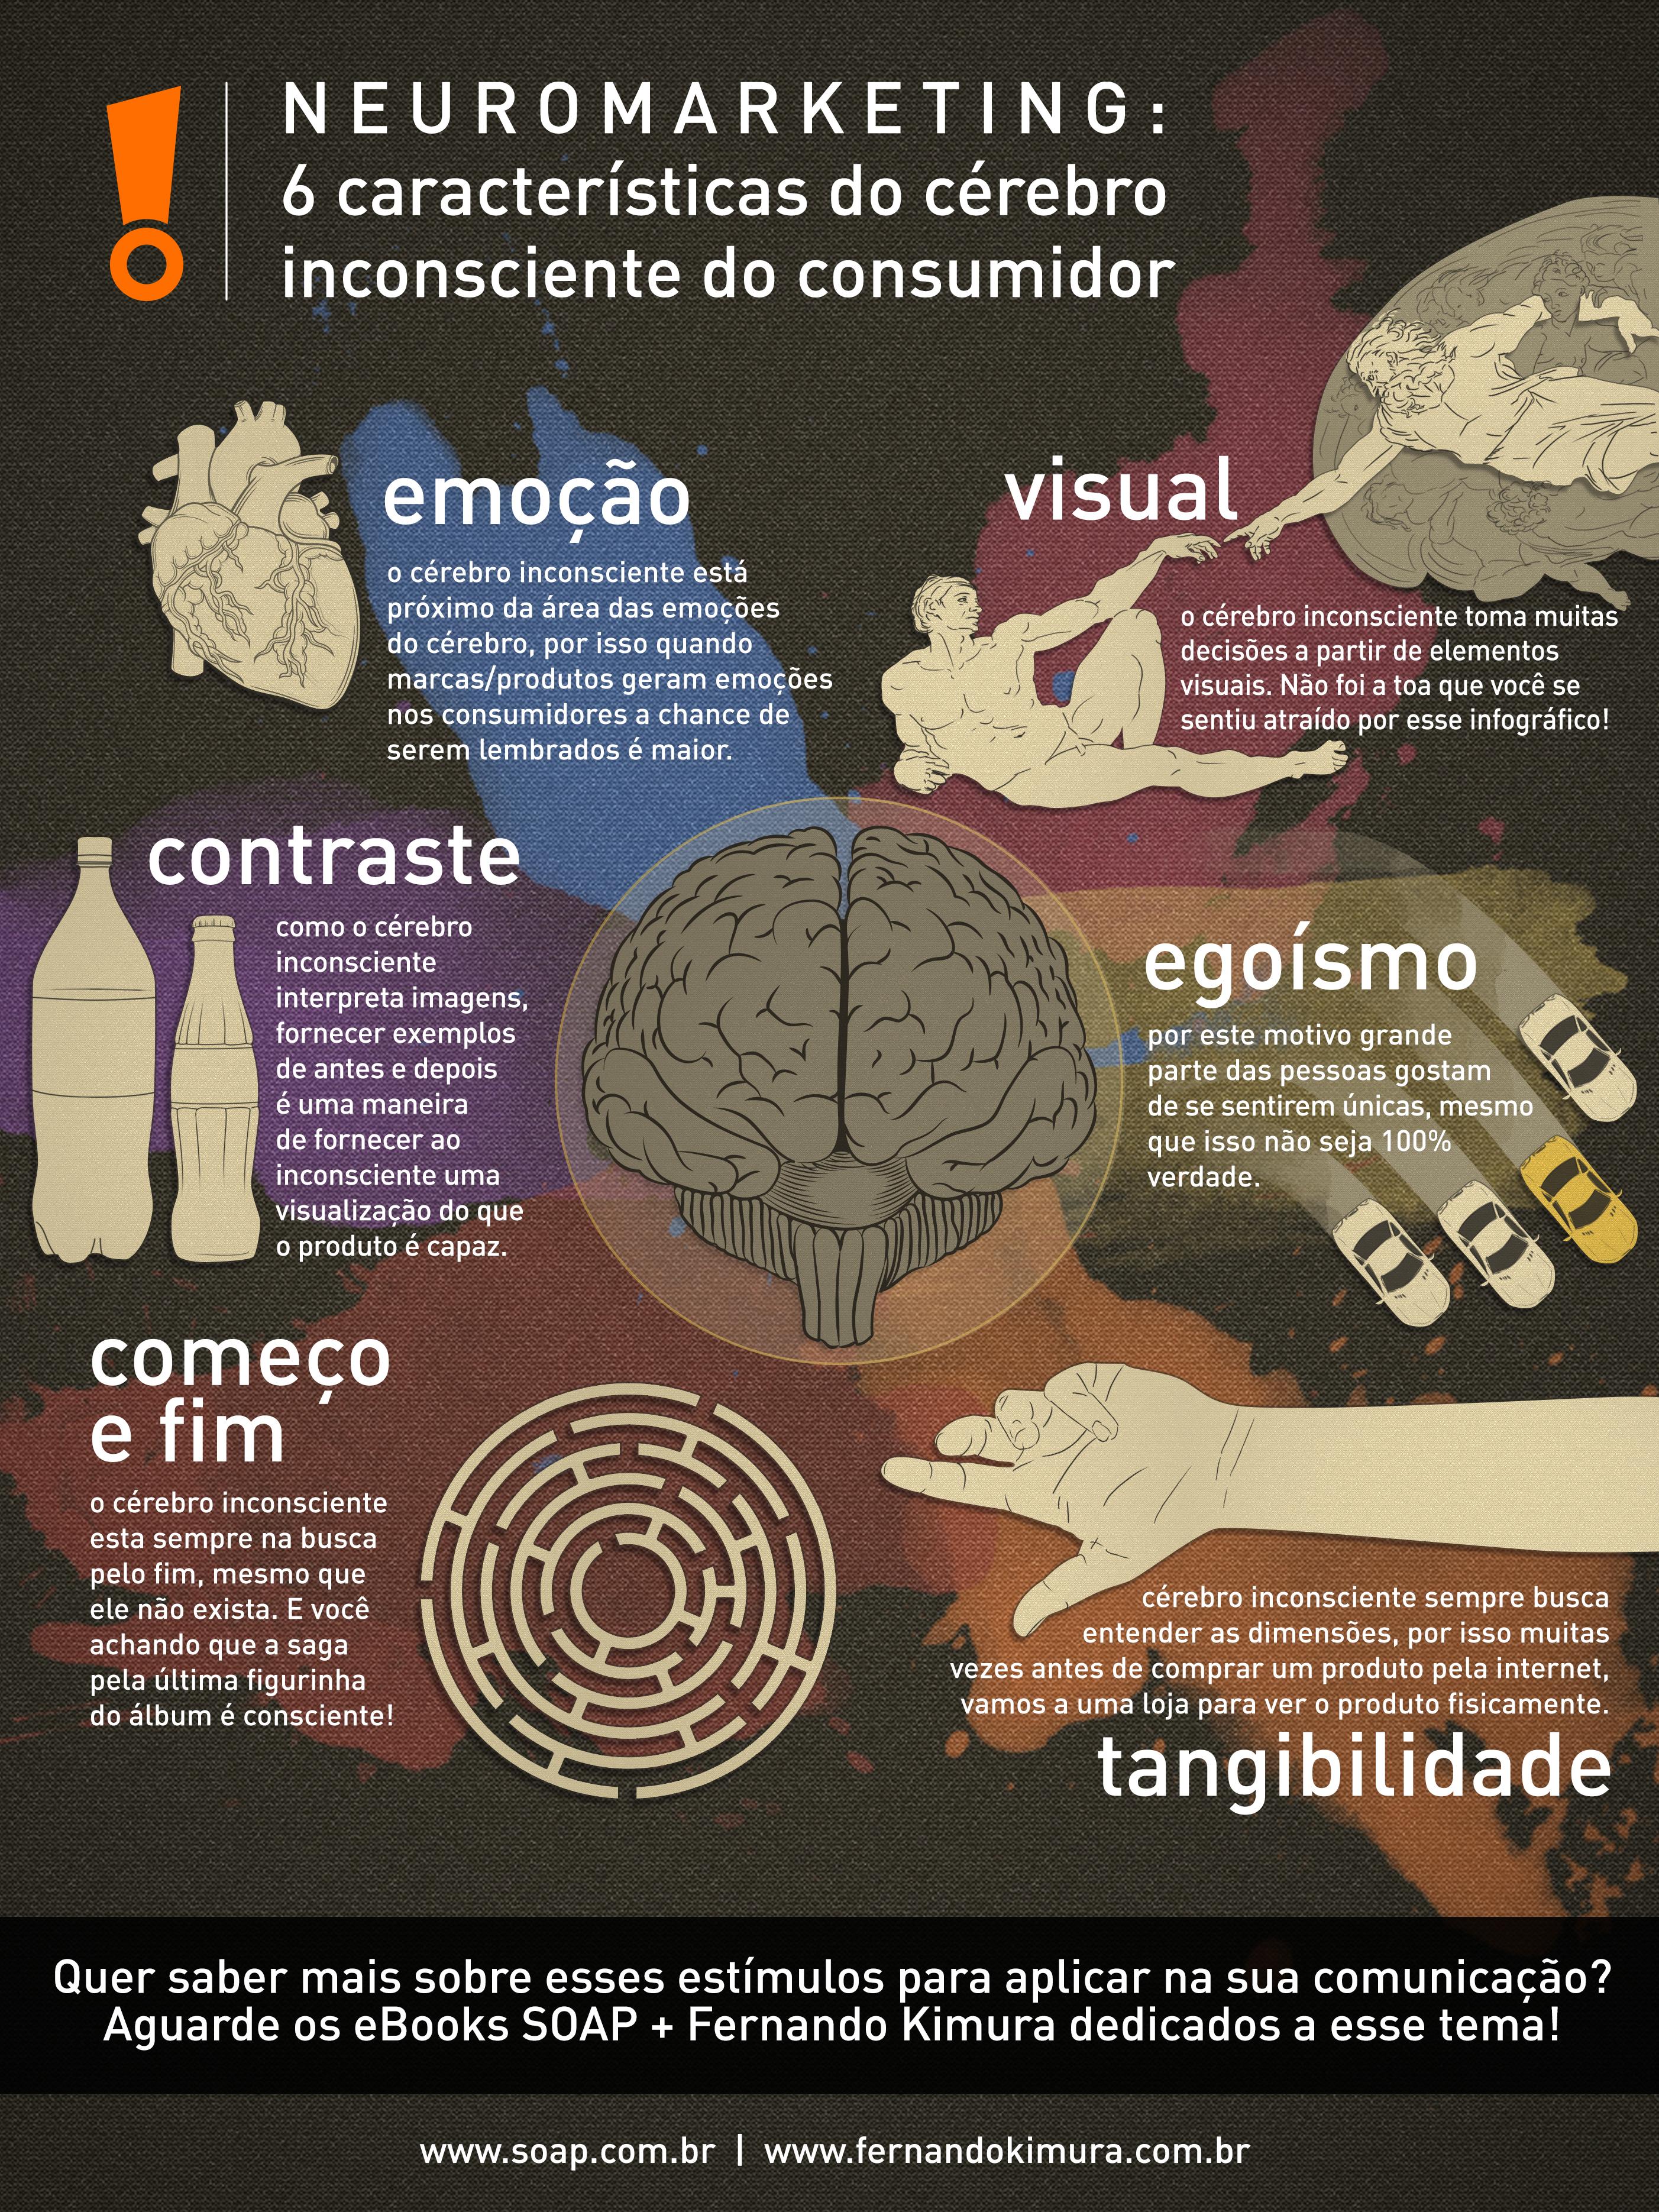 https://rdstation-static.s3.amazonaws.com/cms%2Ffiles%2F8%2F1447261860%5BSOAP%5D+Infografico_6+caracteristicas+do+cerebro.jpg